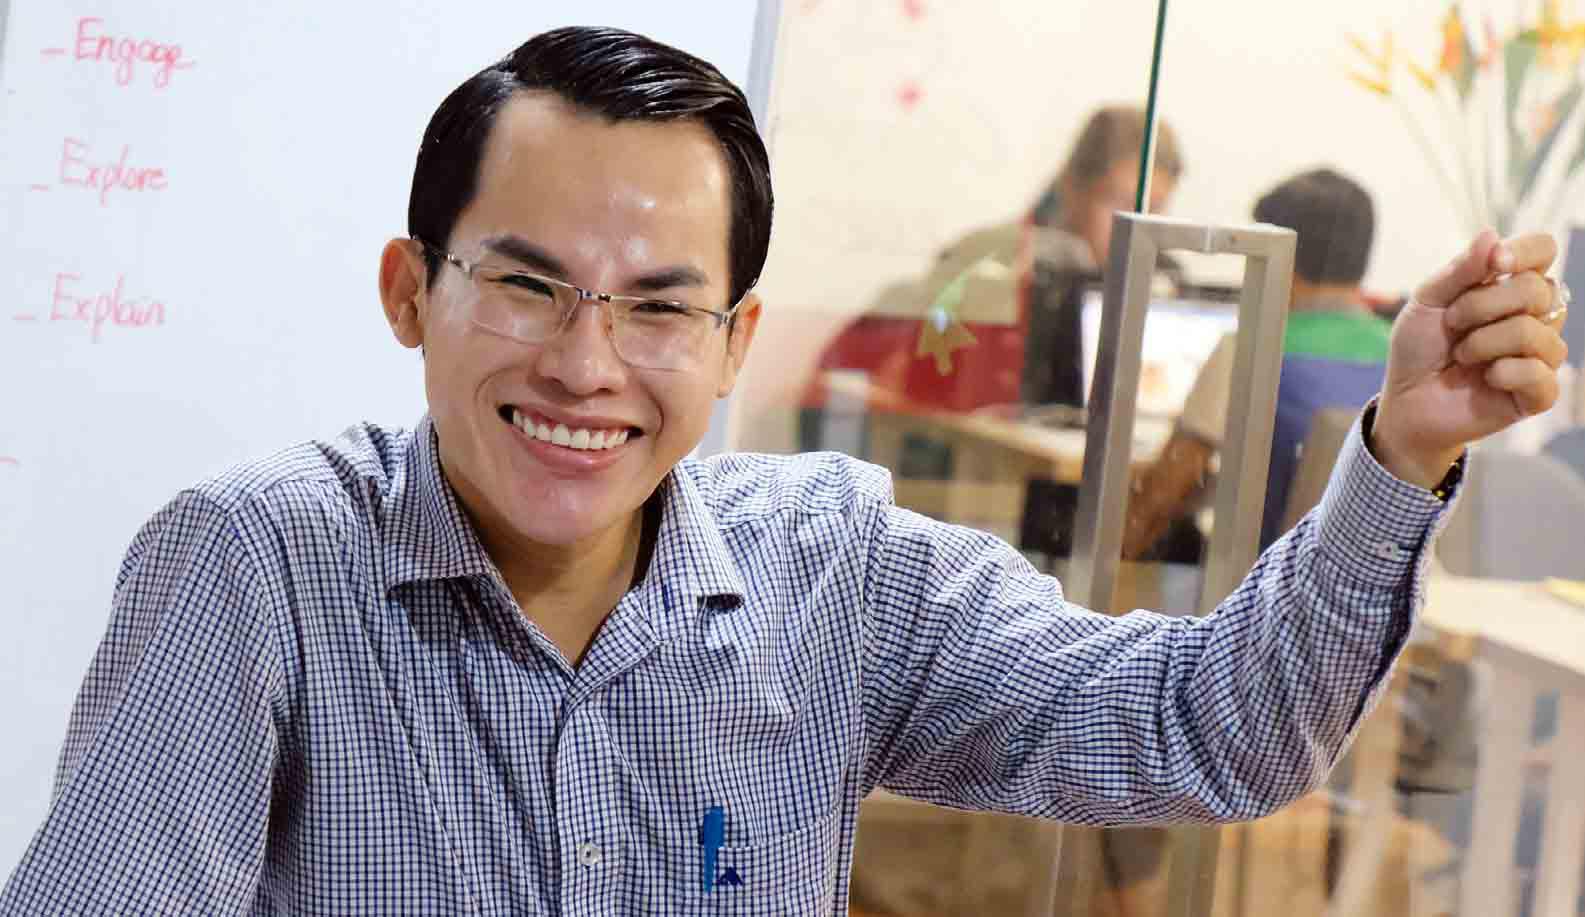 Man's inspiring journey from Saigon orphanage to seat at European Forum Alpbach